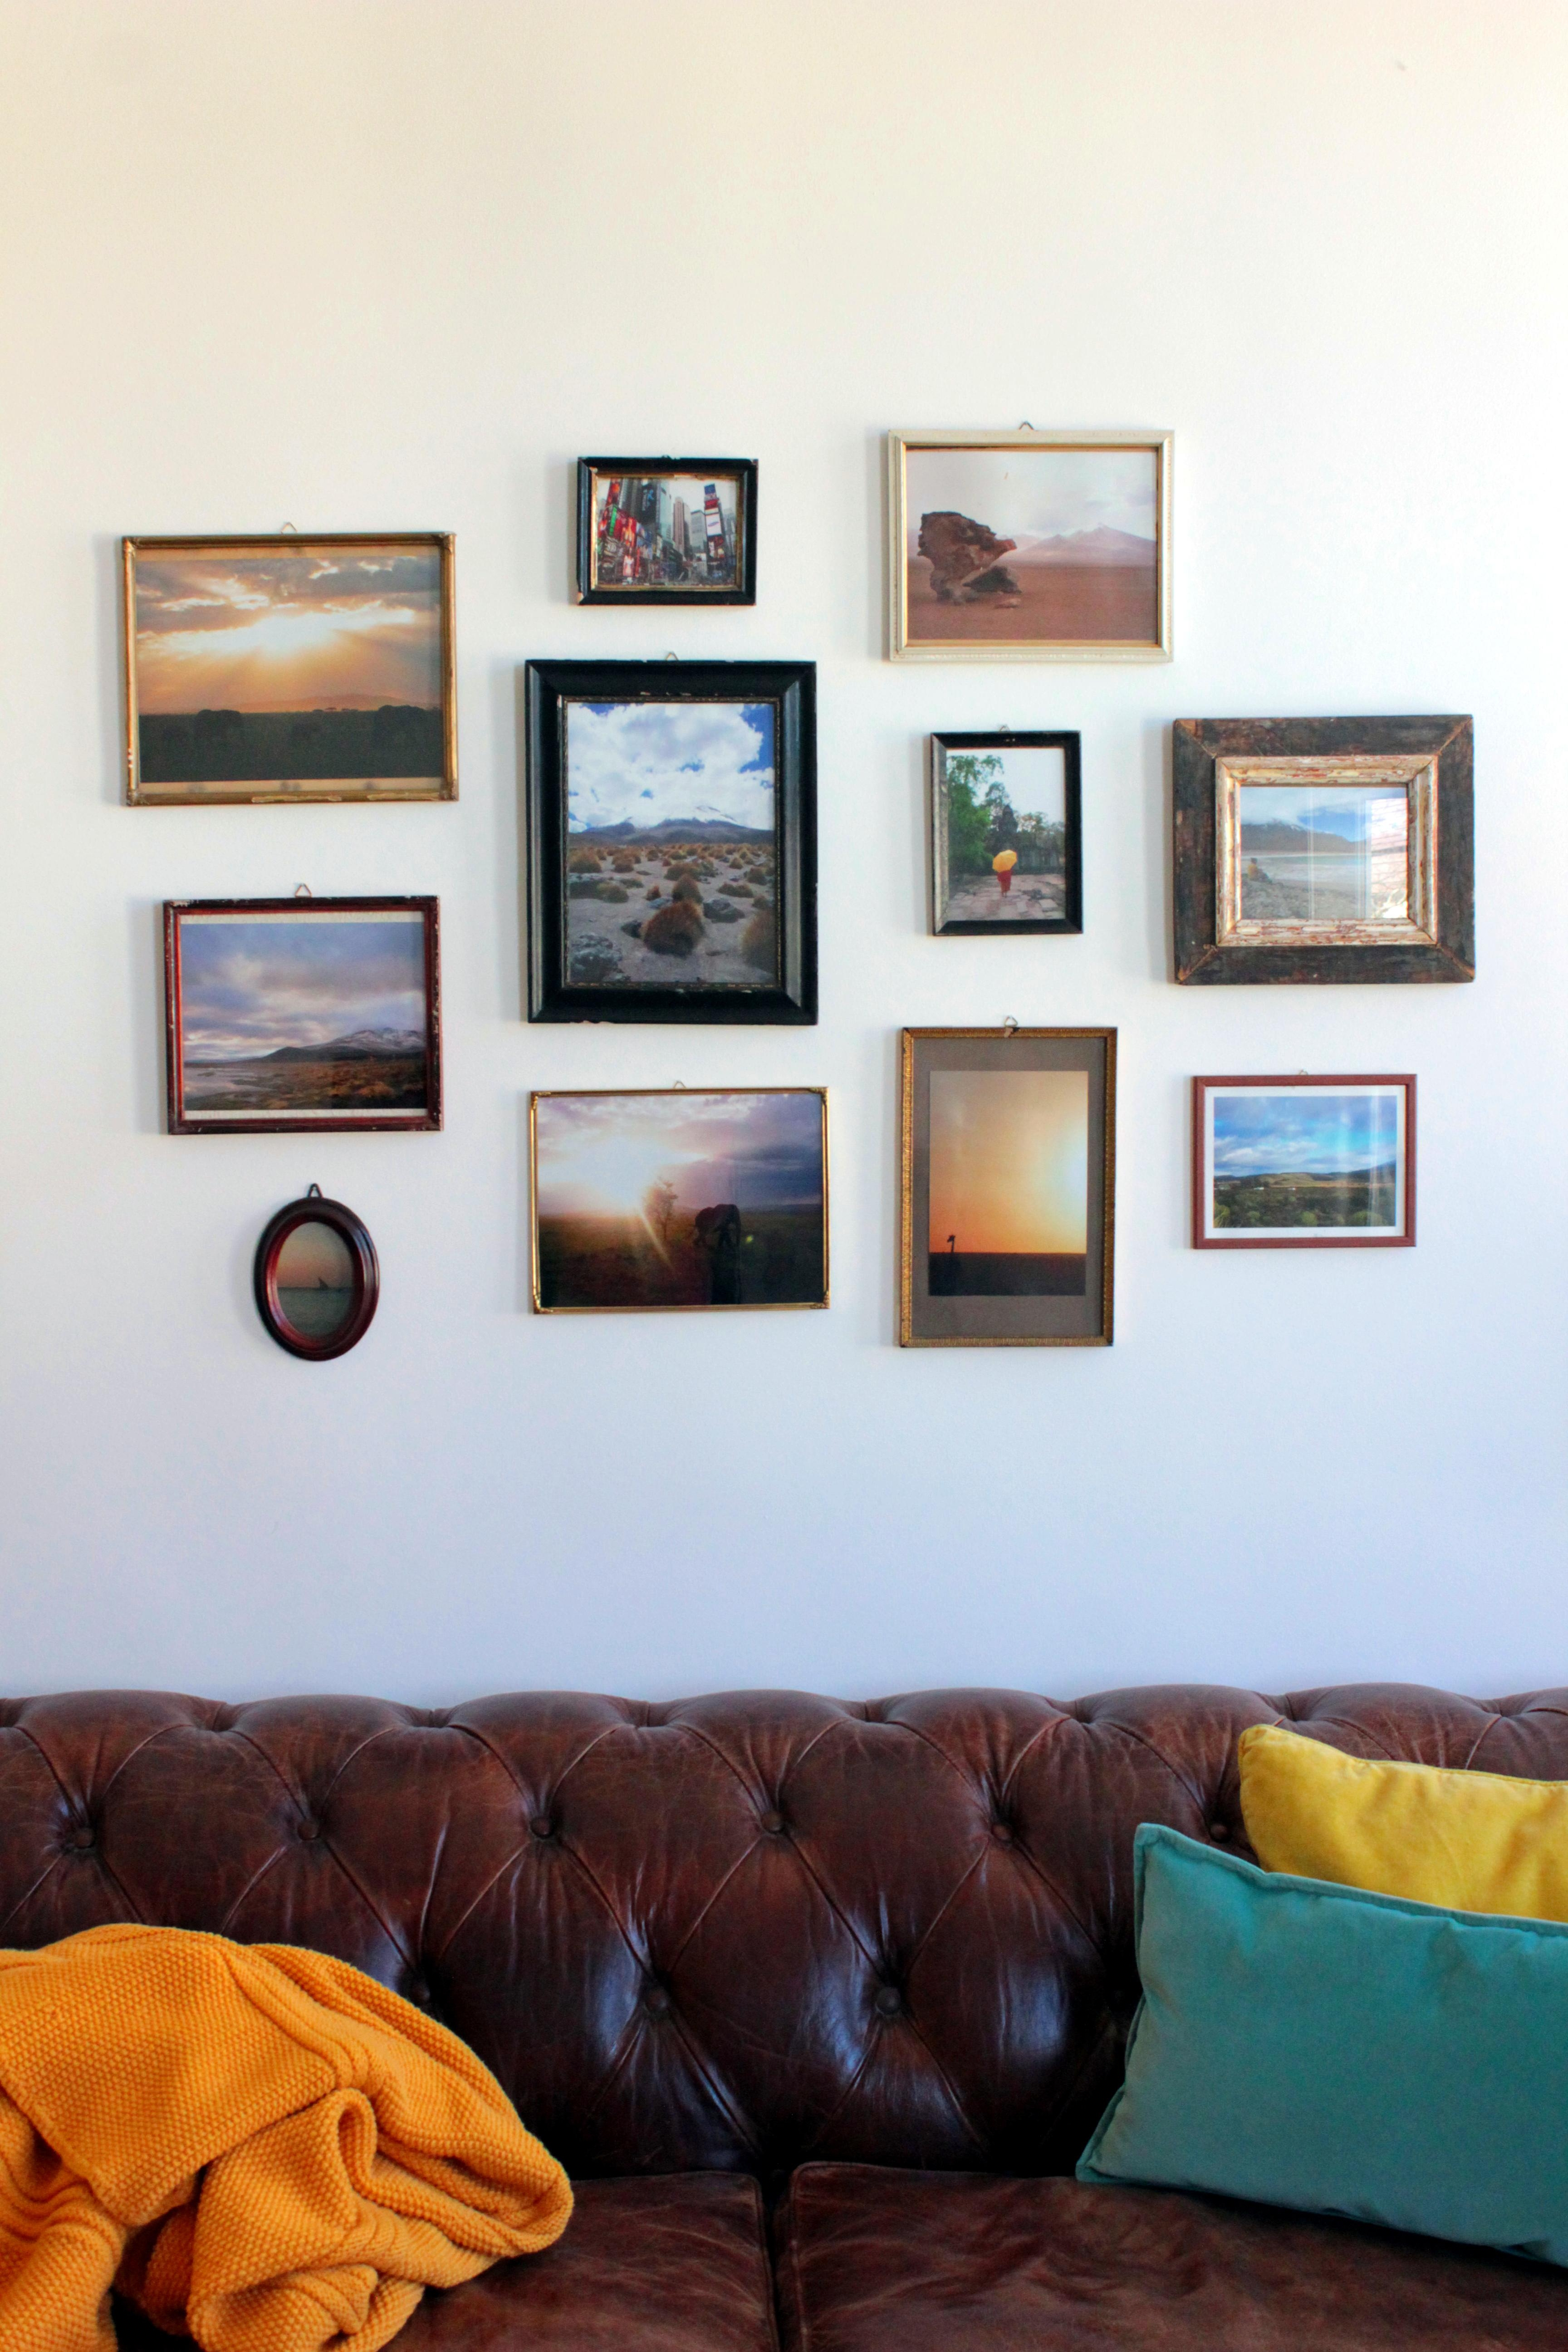 bilderwand ideen inspiration bei couch. Black Bedroom Furniture Sets. Home Design Ideas